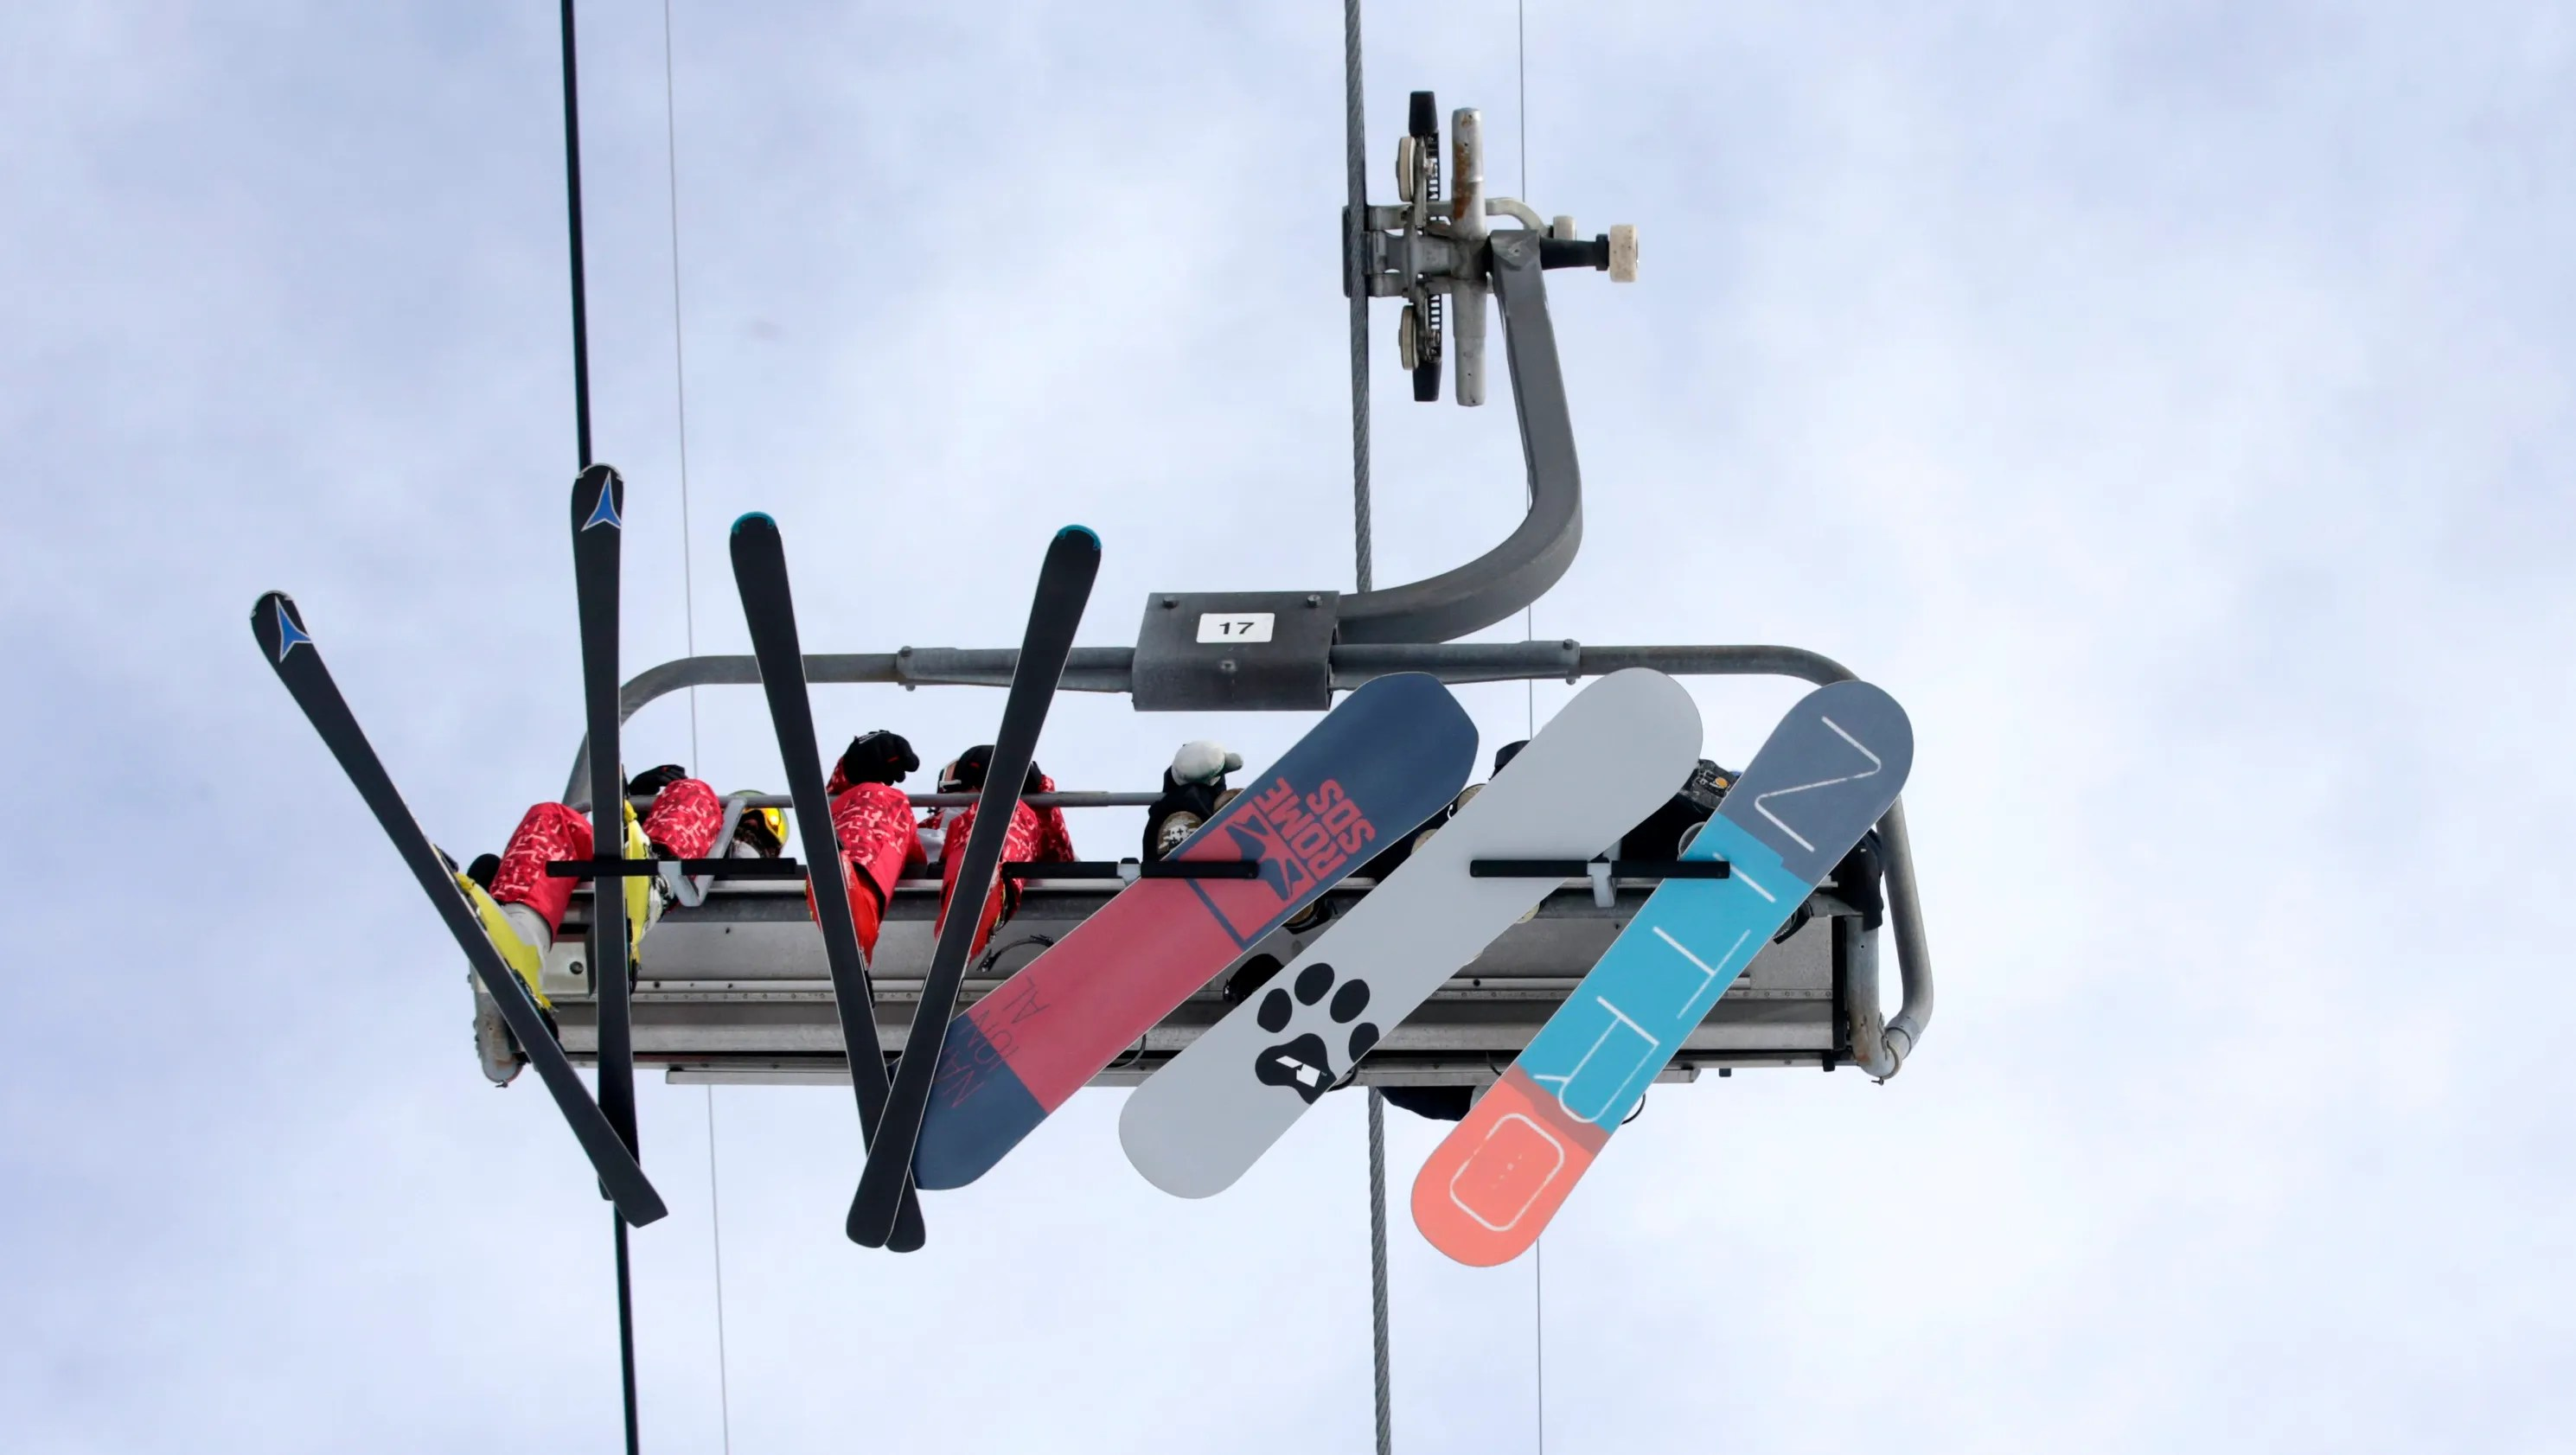 ski chair lift malfunction staples best ergonomic malfunctions sends riders flying at eastern